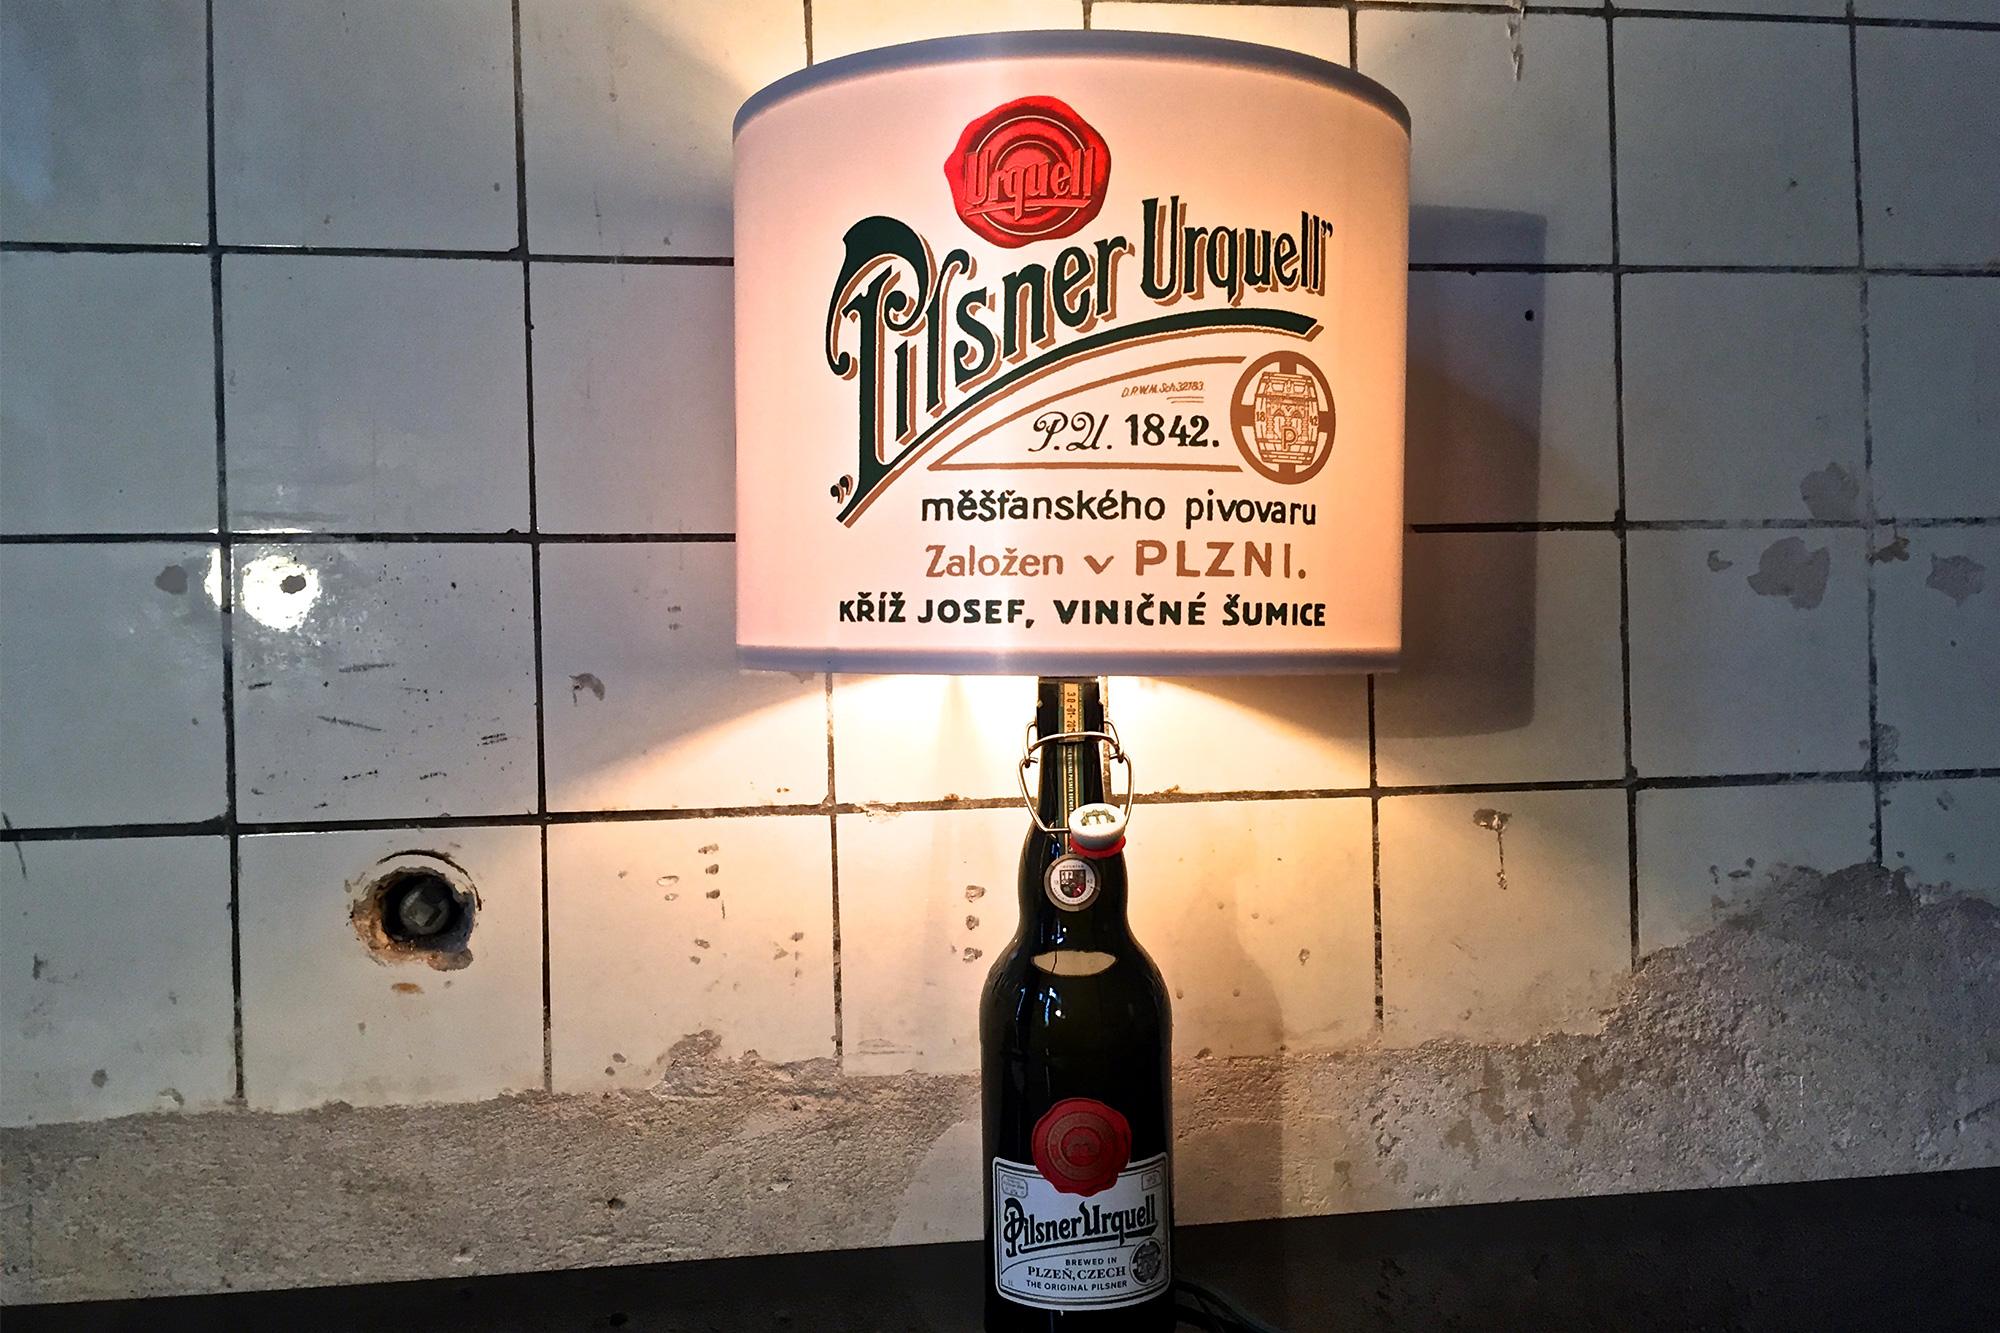 Pilsner Urquell POSM Design Stil Manipulation 2014